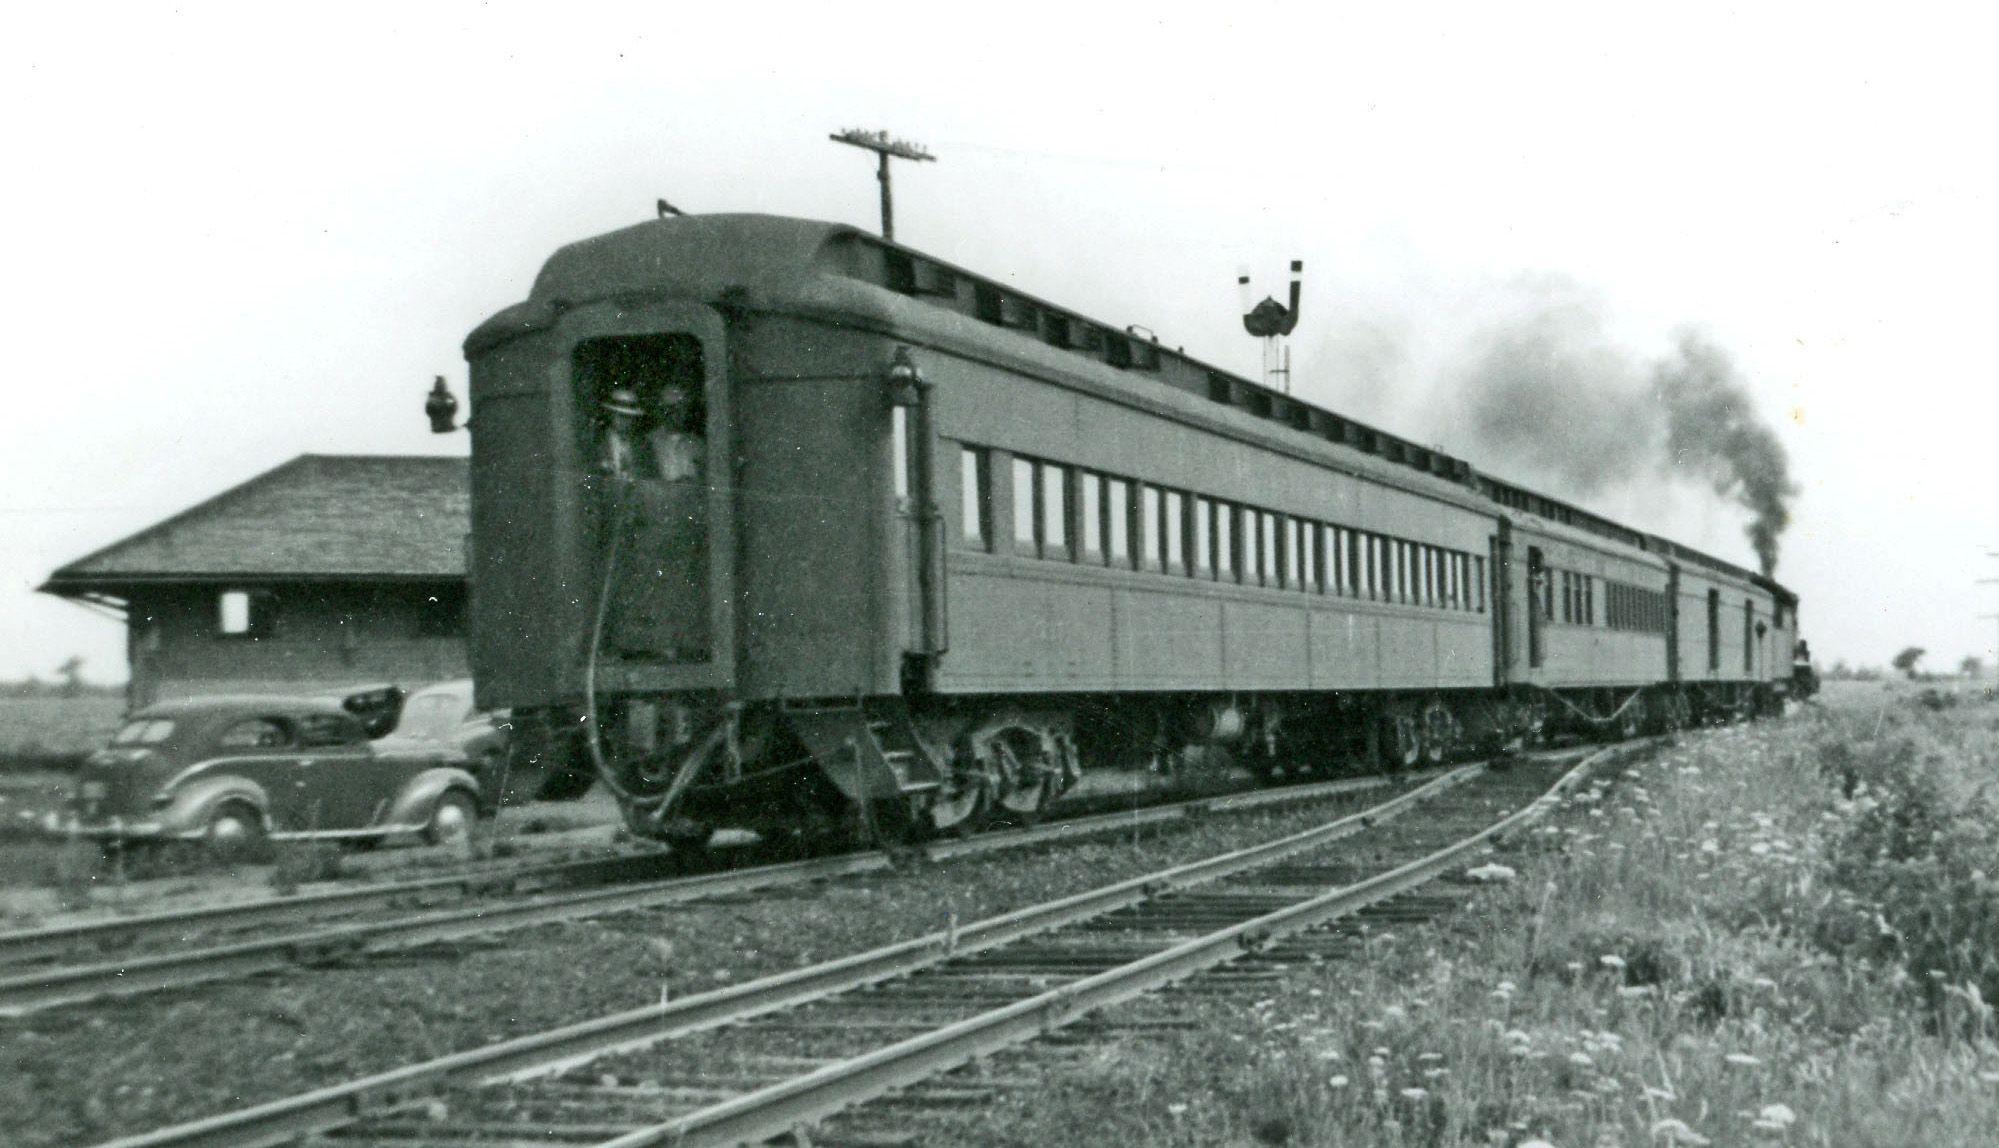 Ann Arbor Railroad passenger train at Dundee, Michigan, c